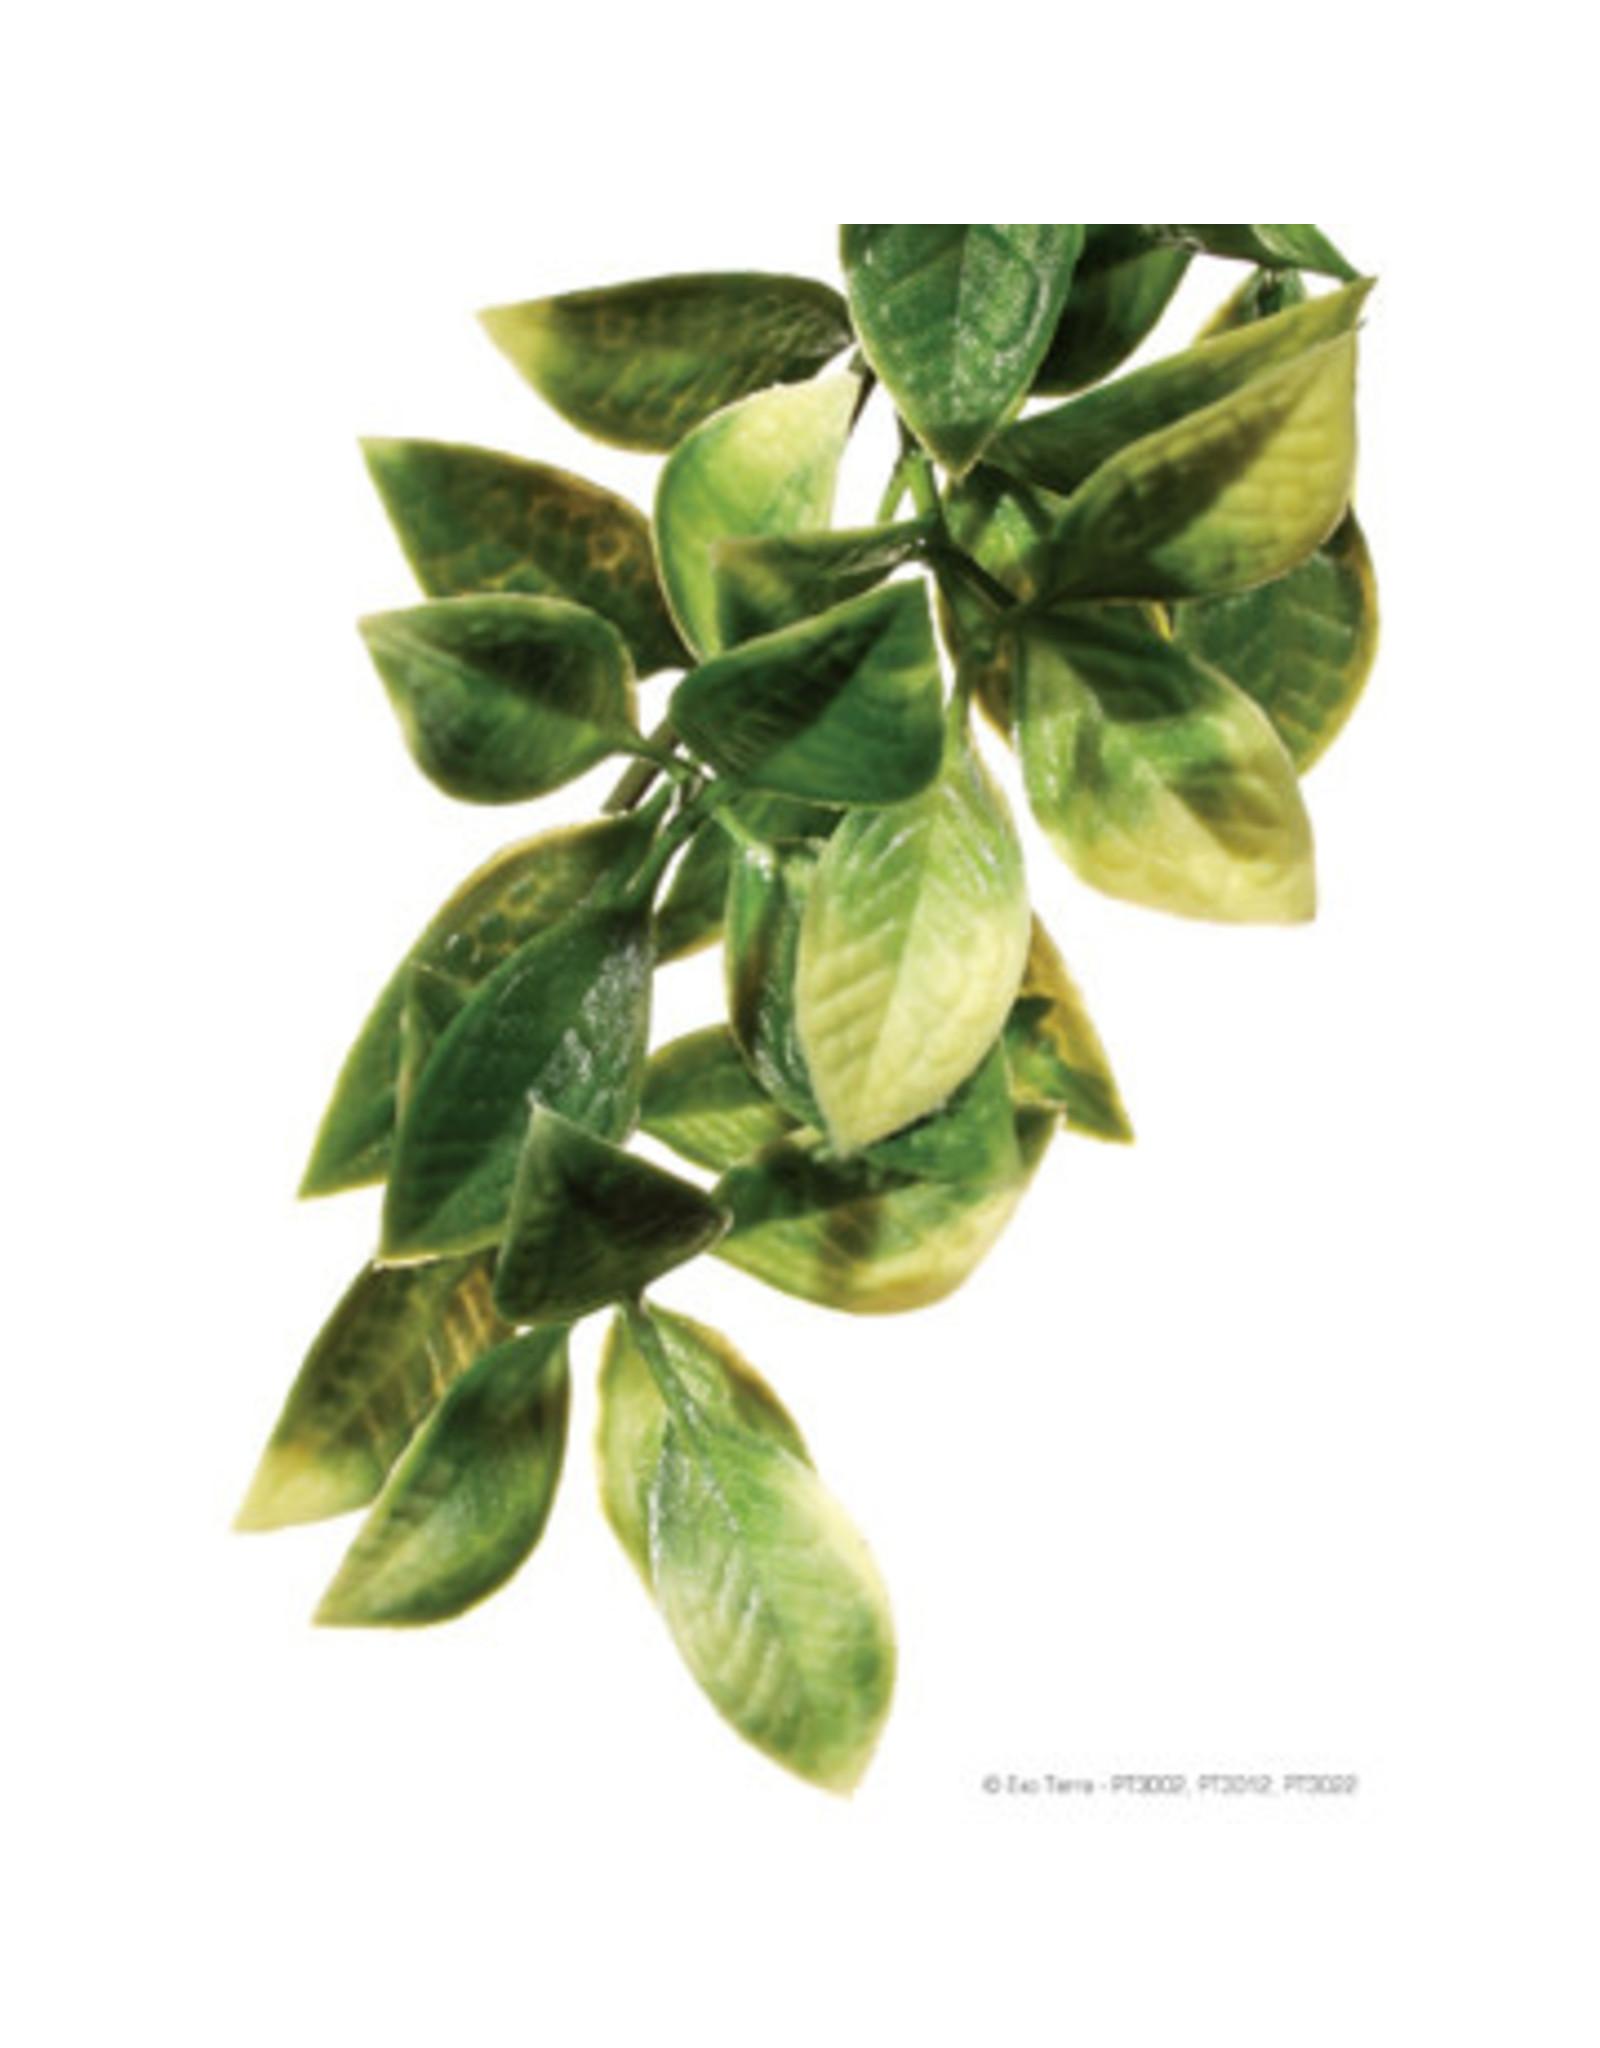 Exo Terra Jungle Plant Mandarin Small